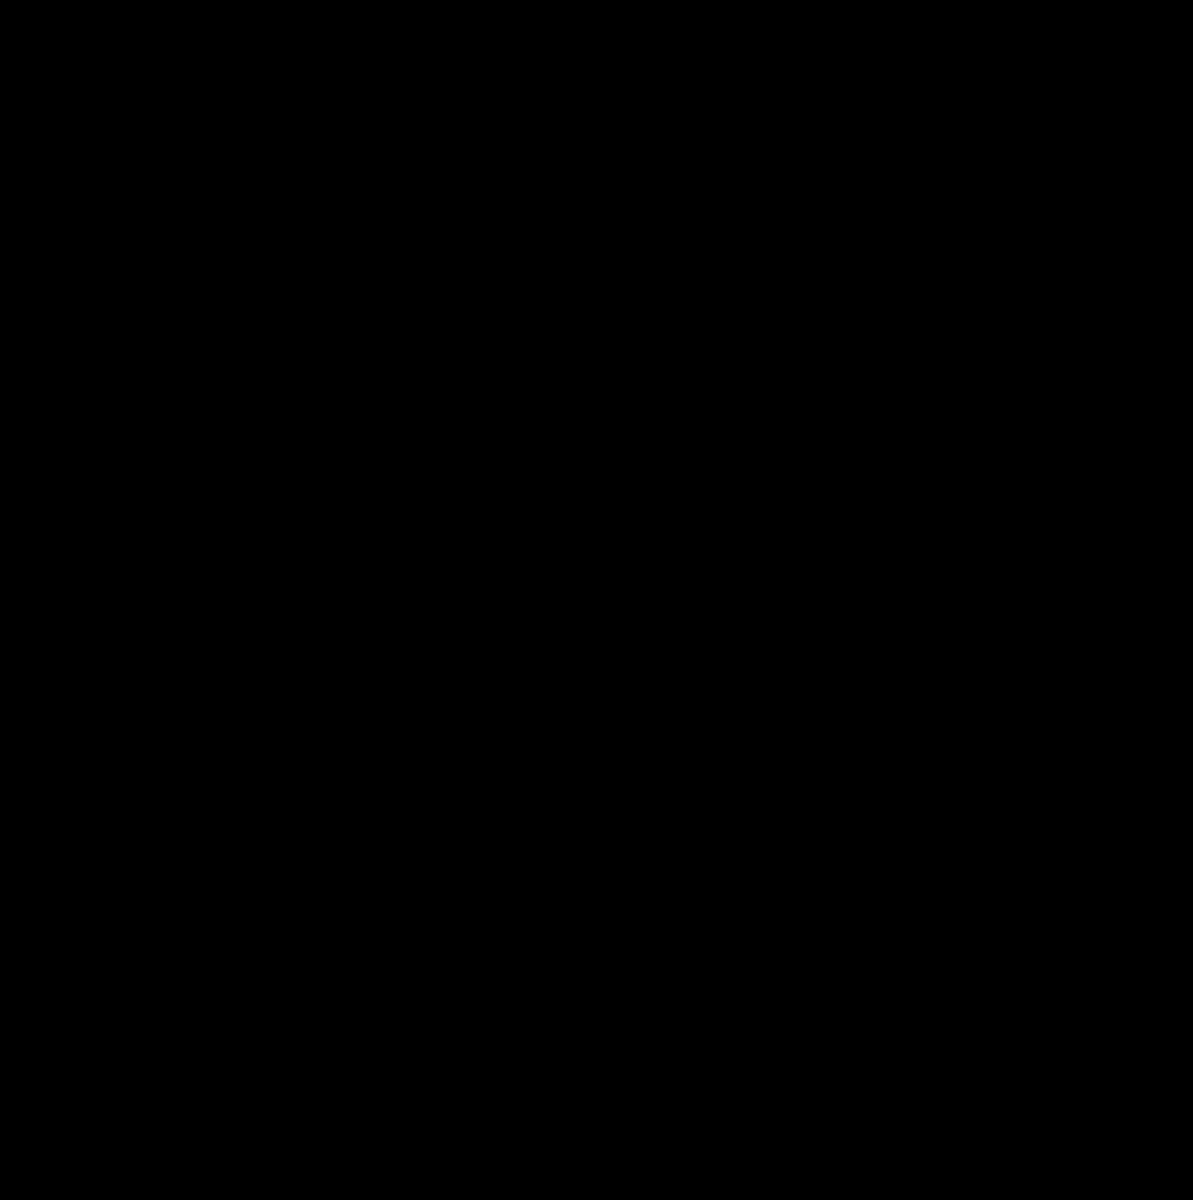 f:id:TIshikiBukuro:20210710160124p:plain